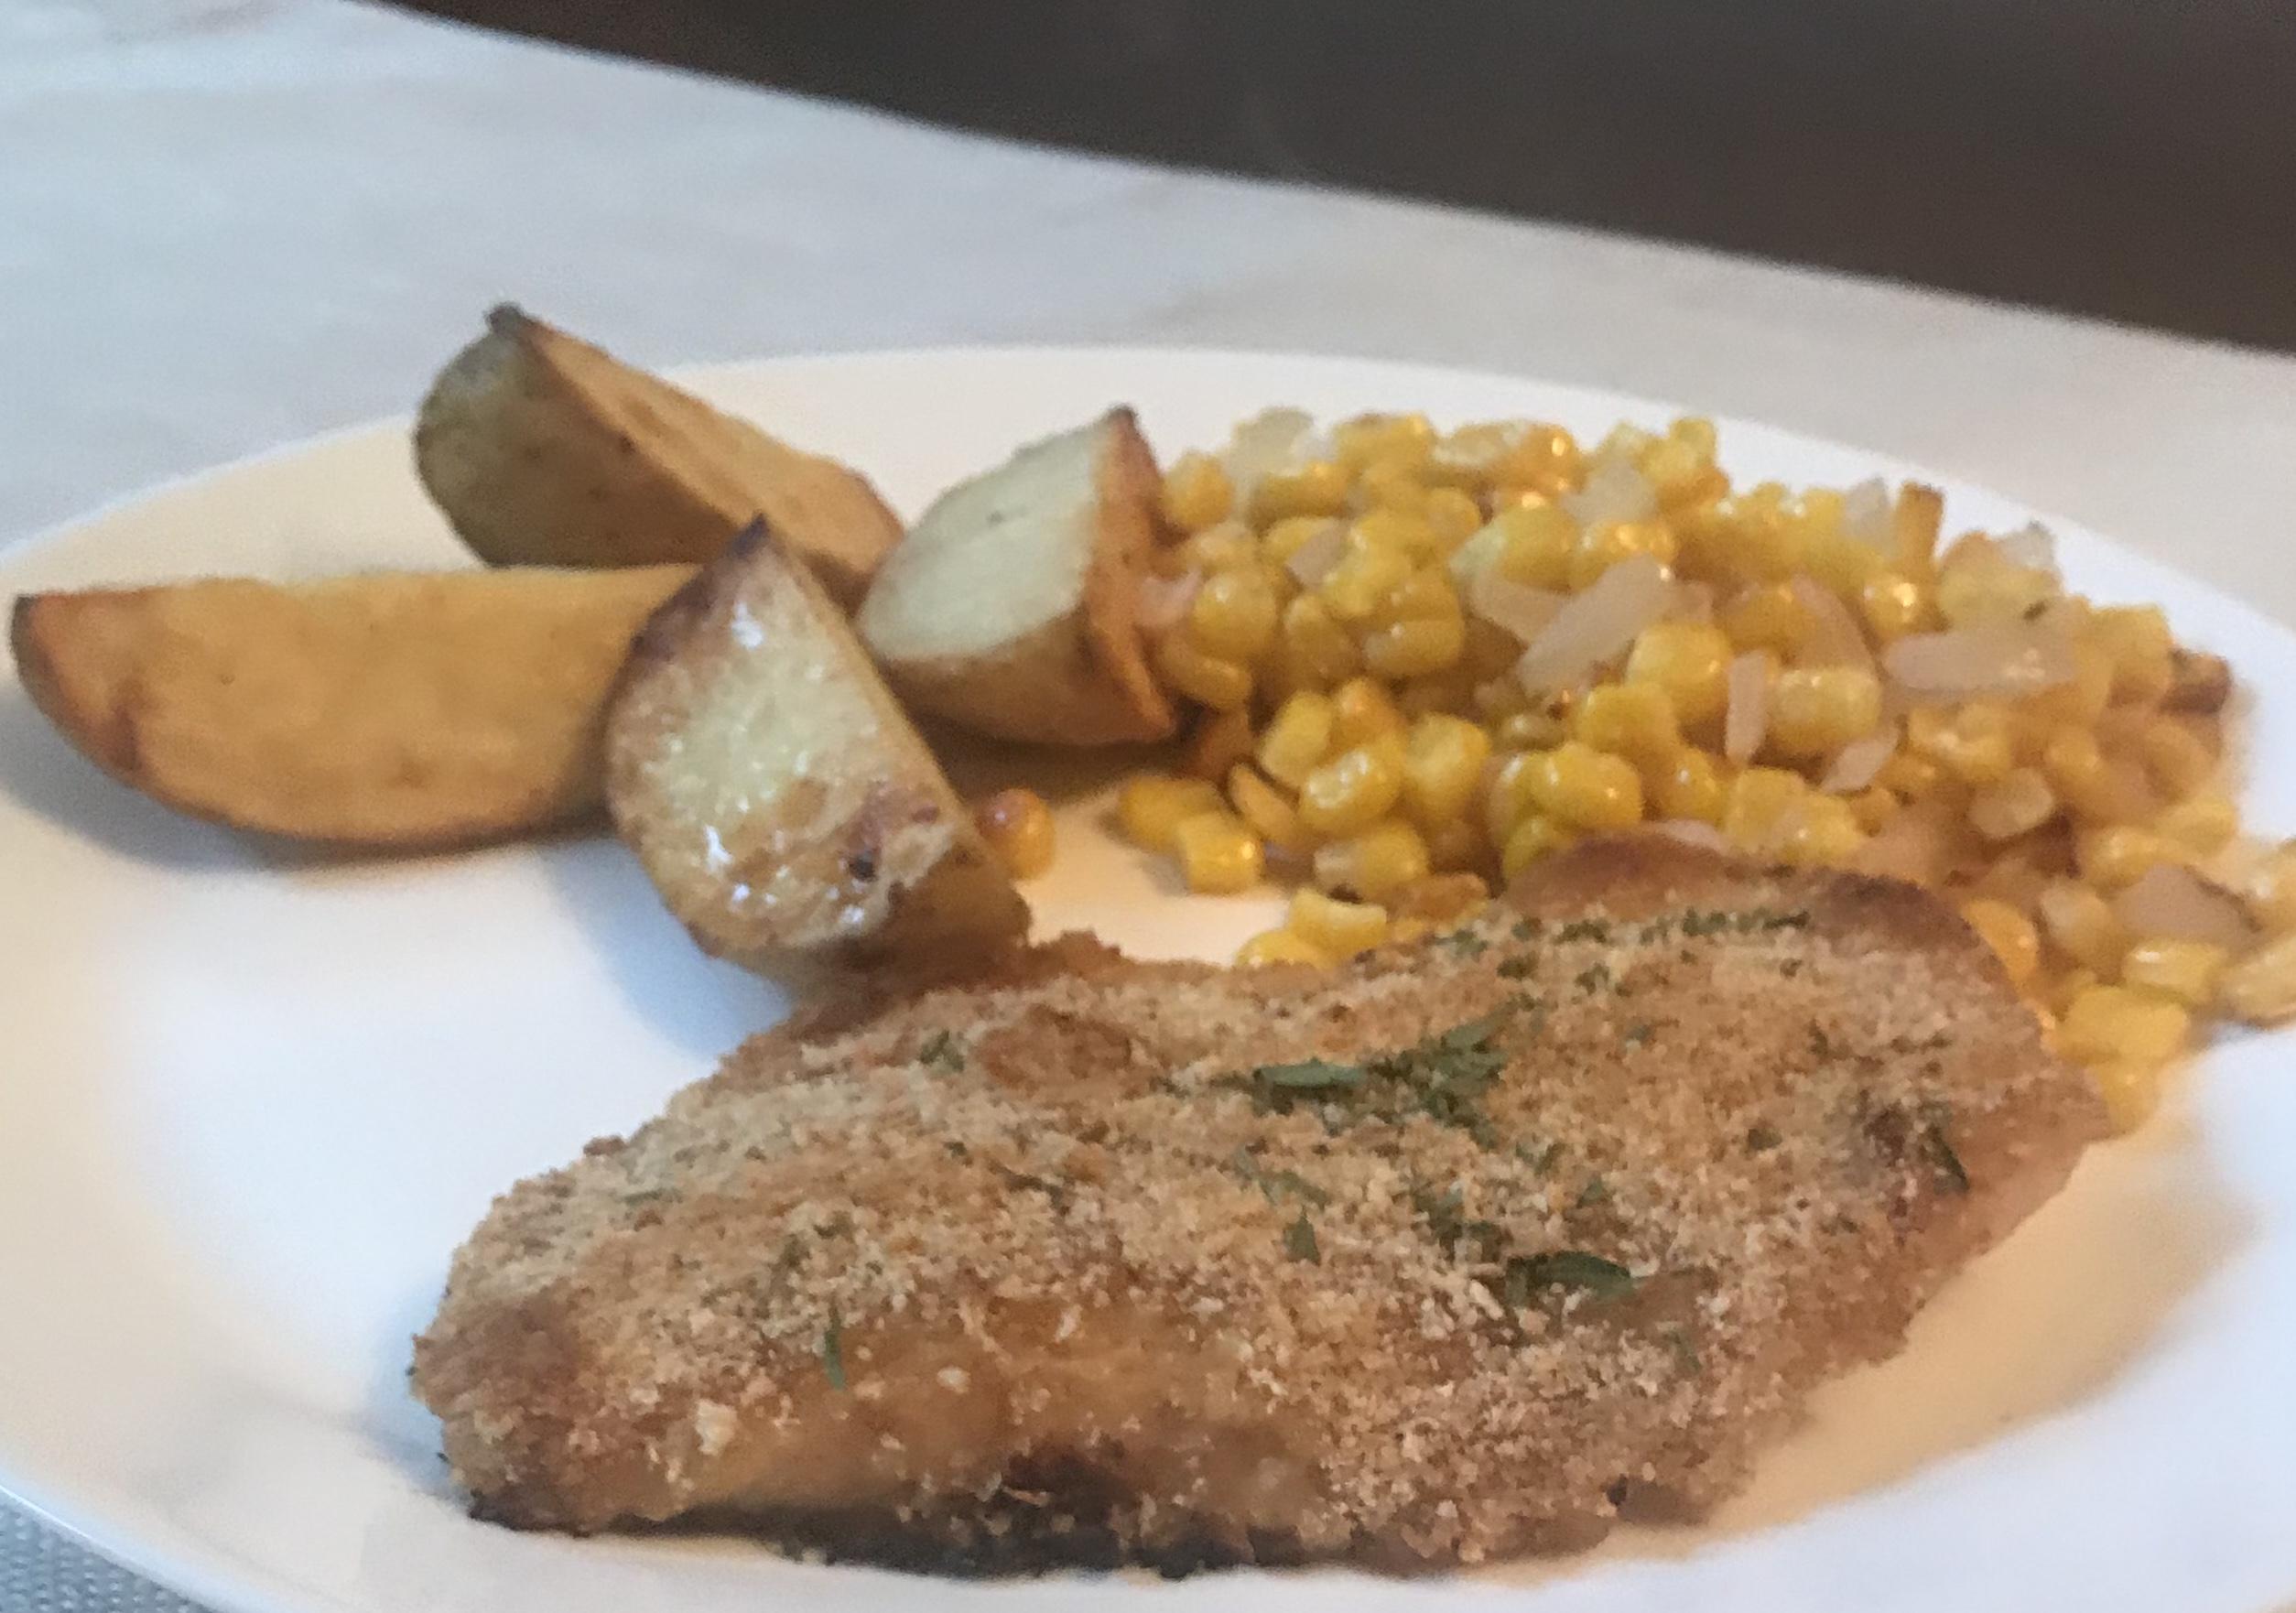 Honey Mustard Chicken Sheet Pan Dinner with Potatoes and Corn image